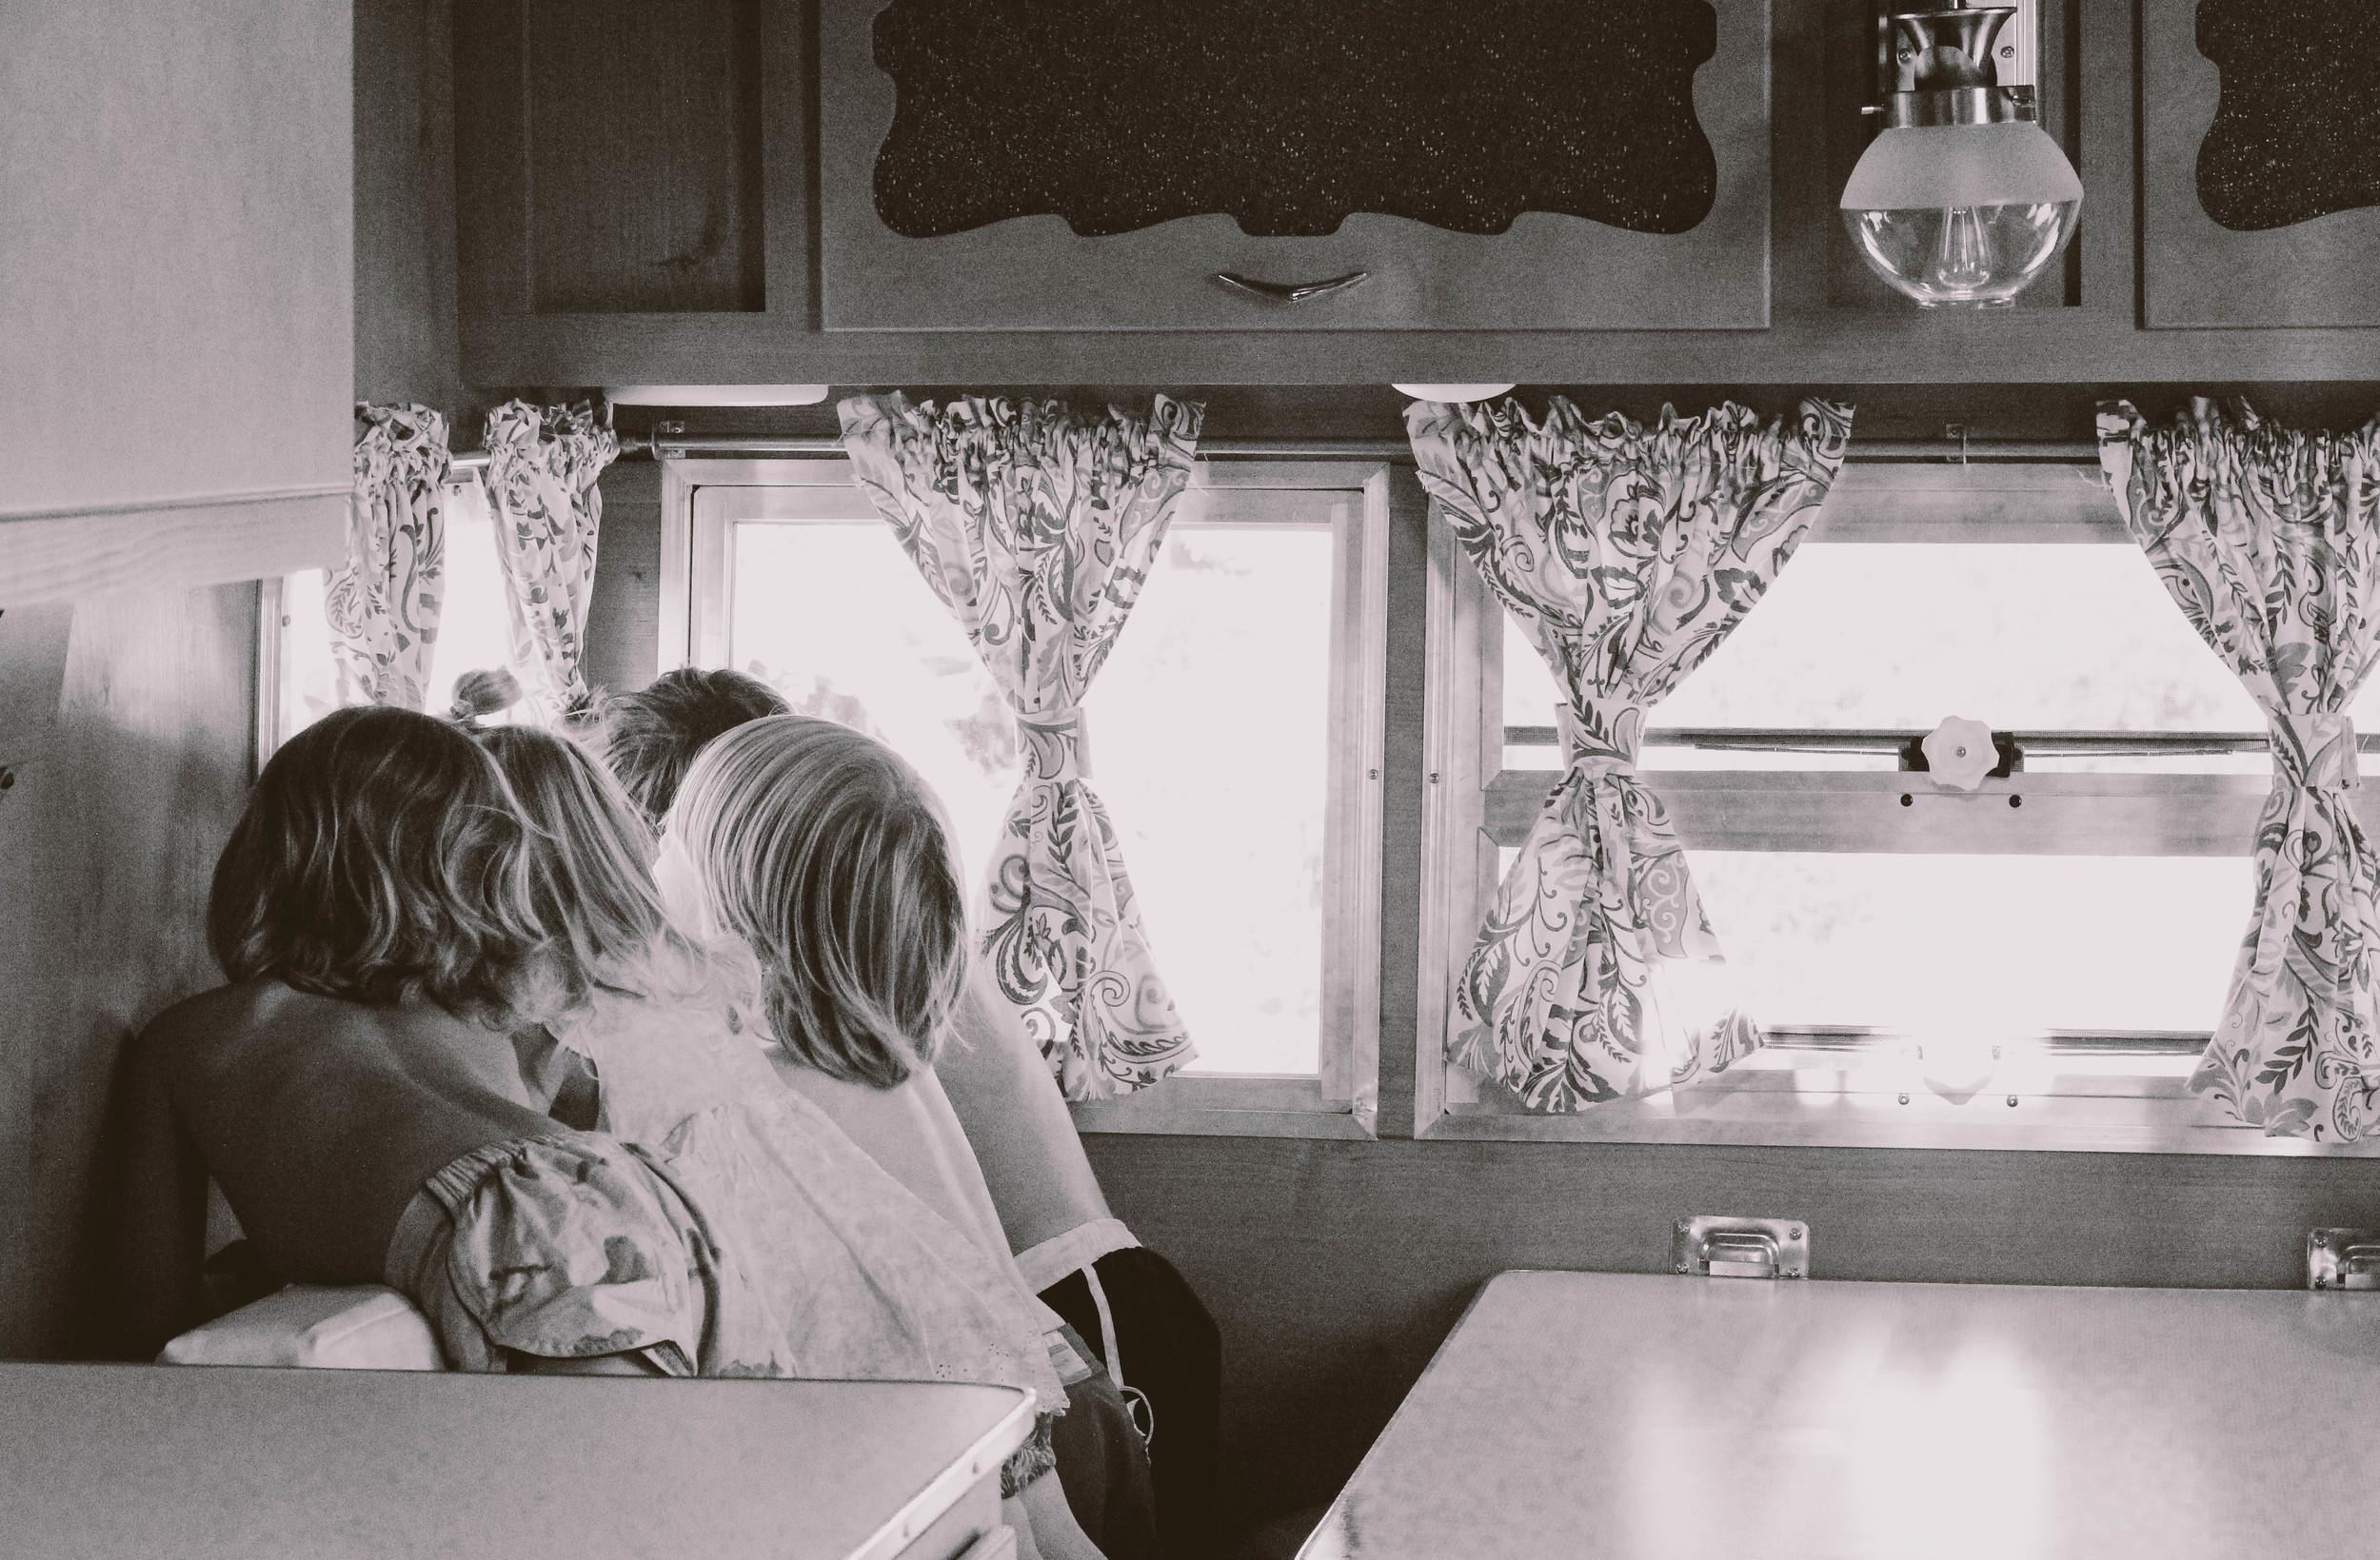 The Holidays vintage camp community 9.jpg